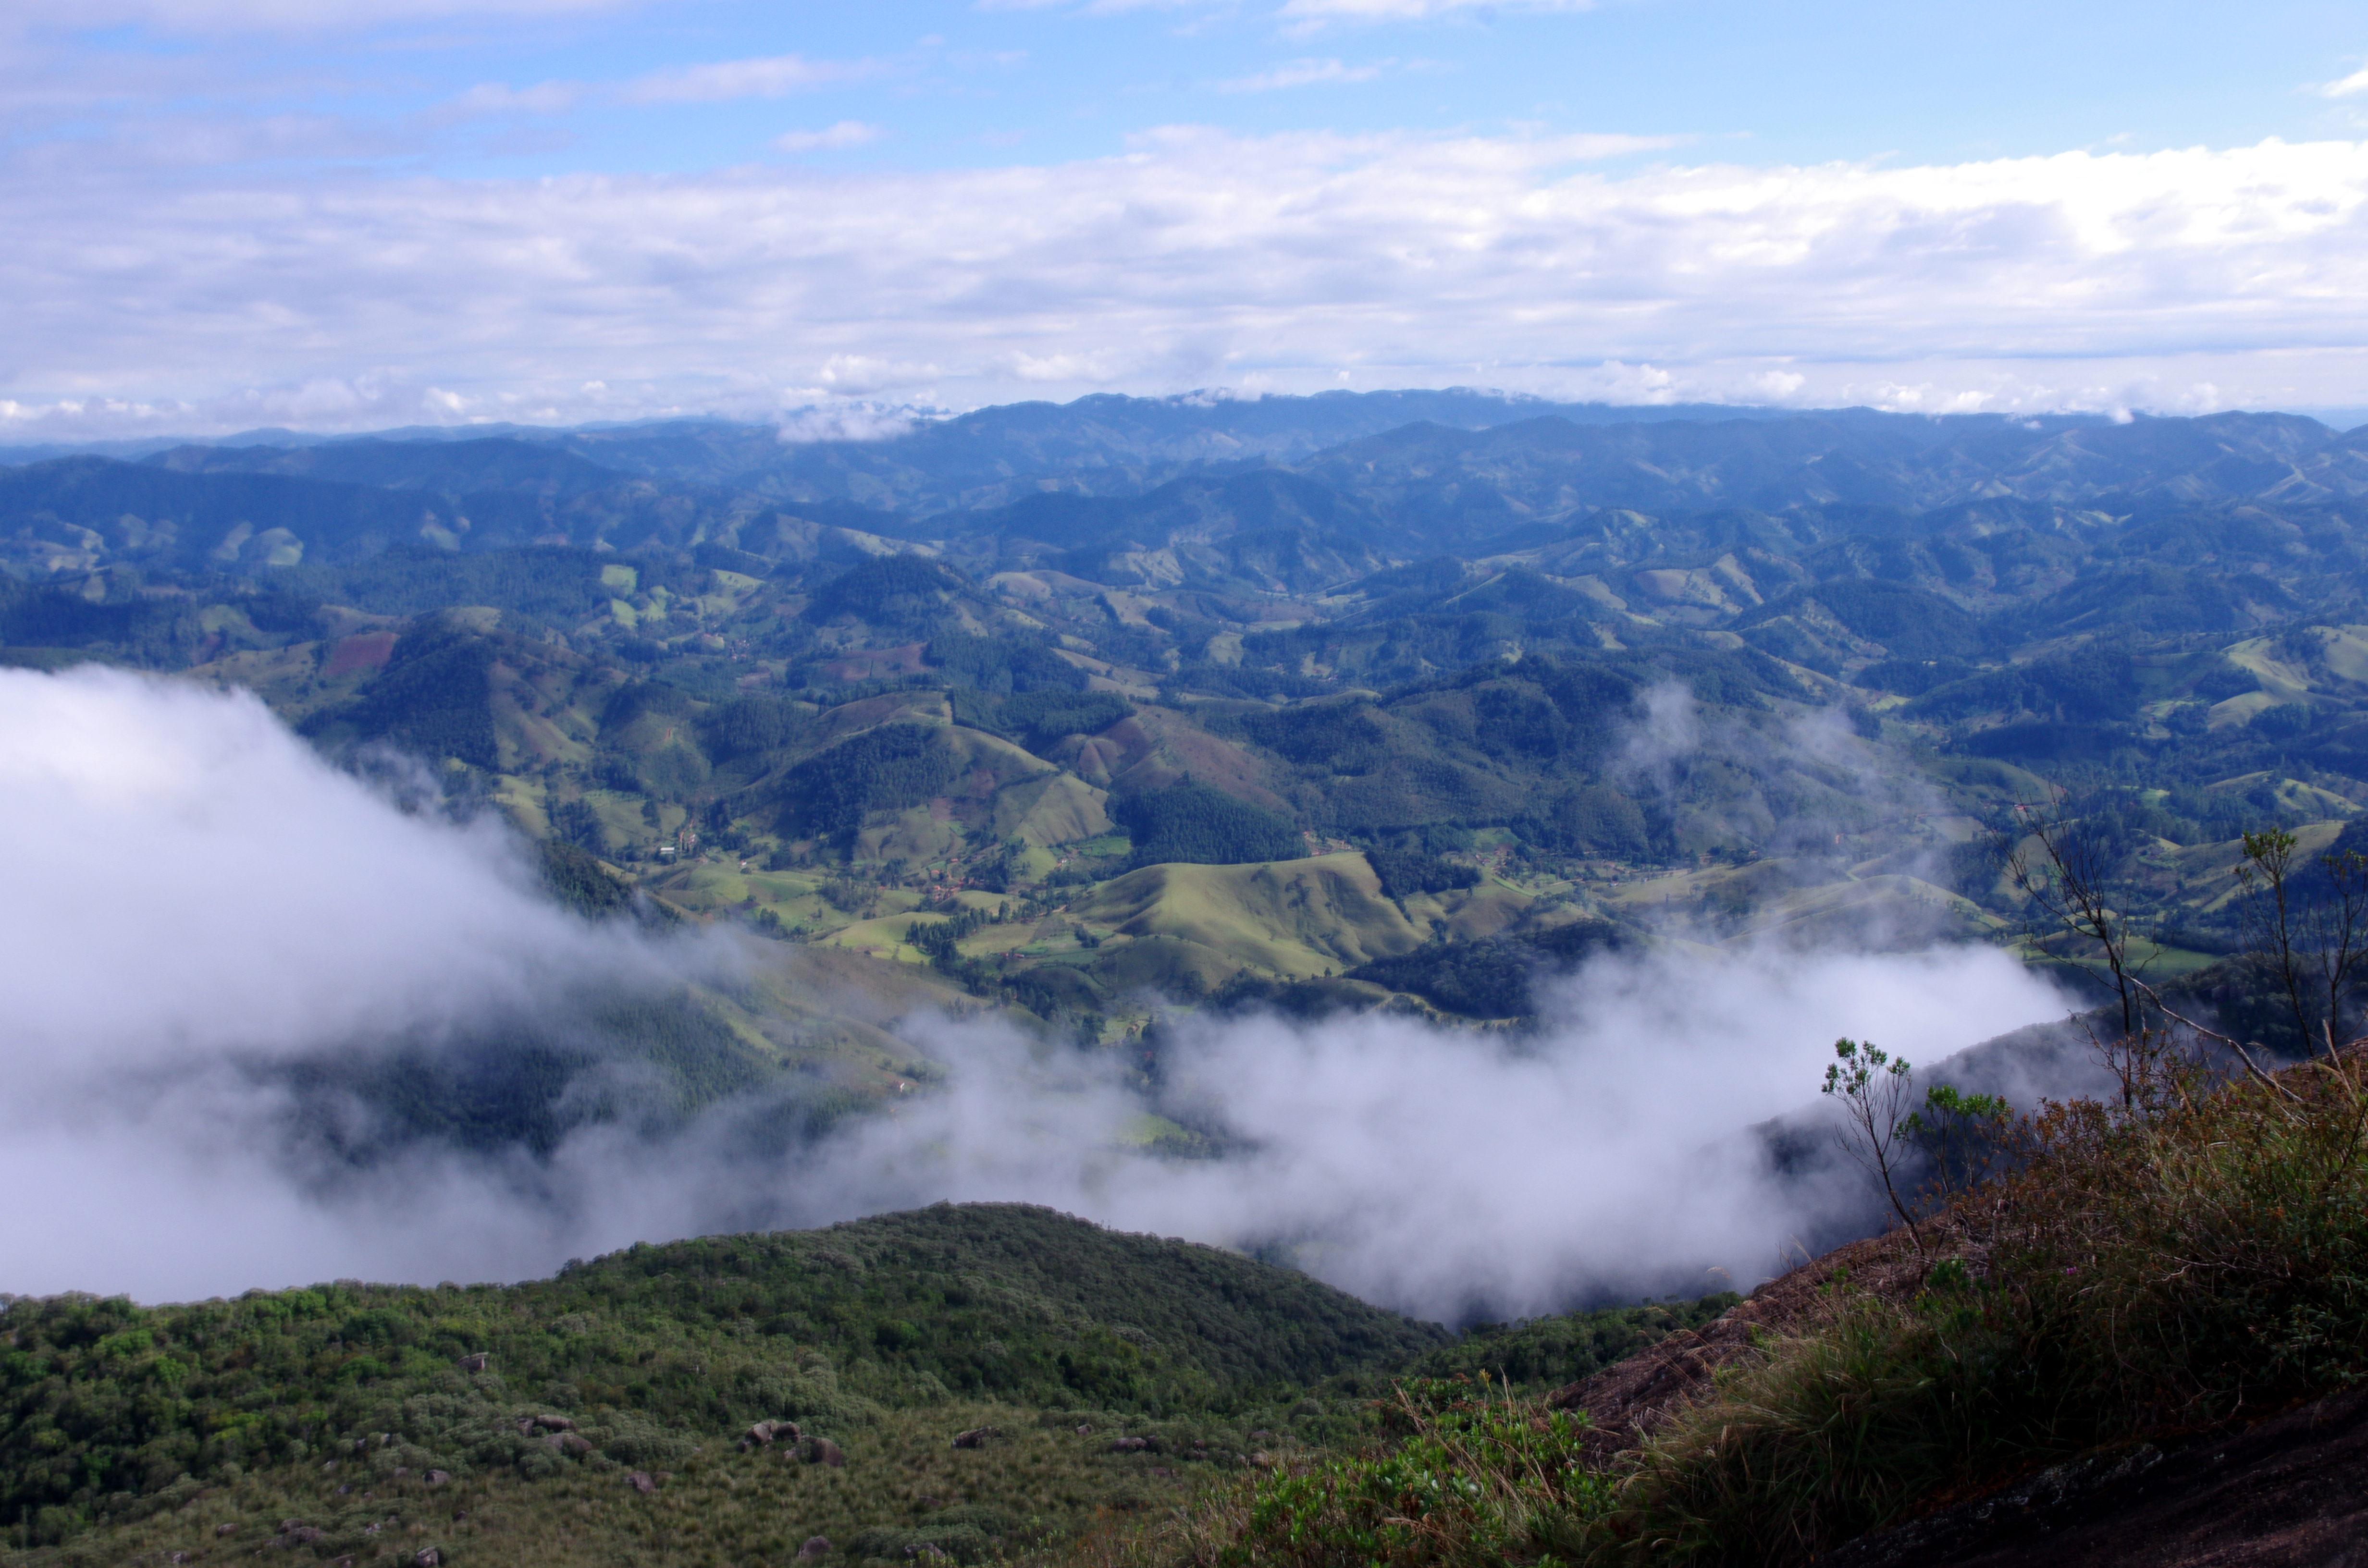 Marmelópolis Minas Gerais fonte: upload.wikimedia.org